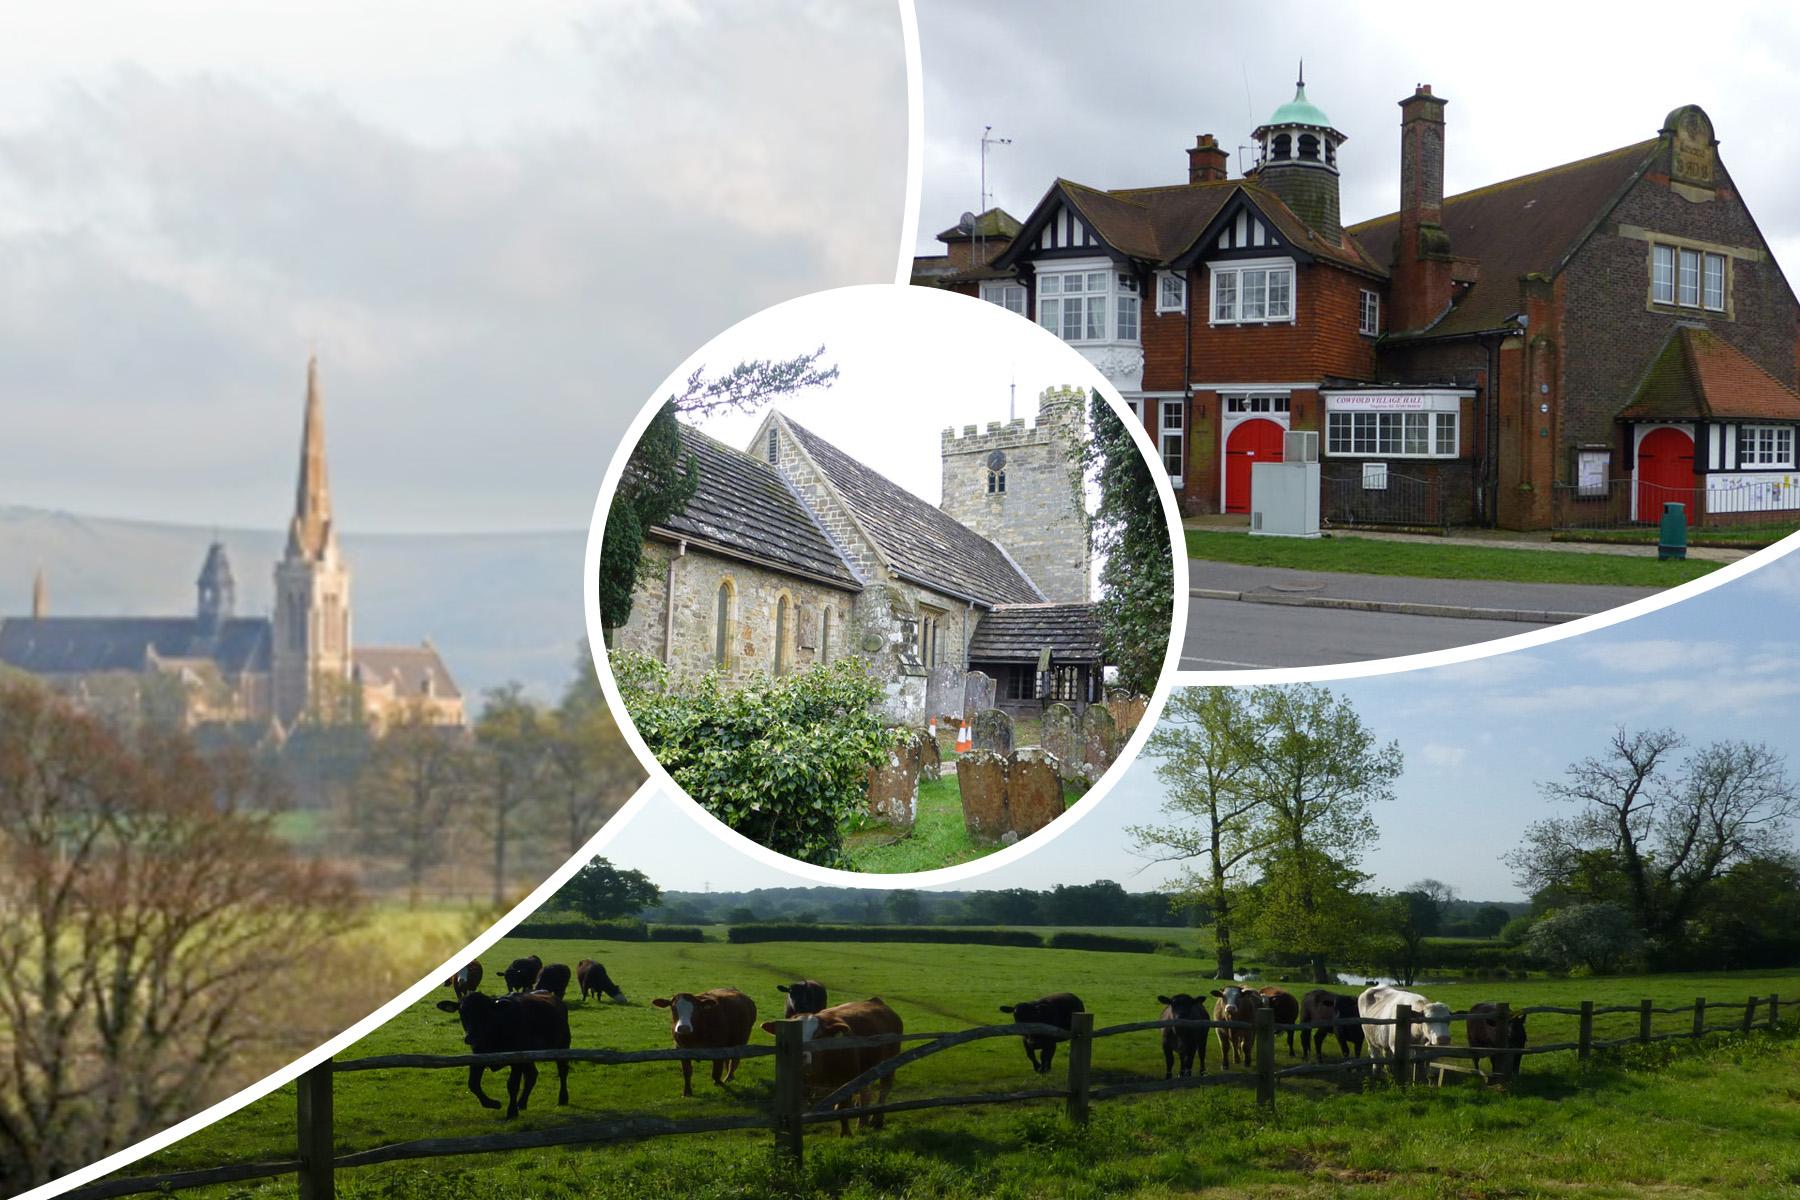 Collage of Village Scenes